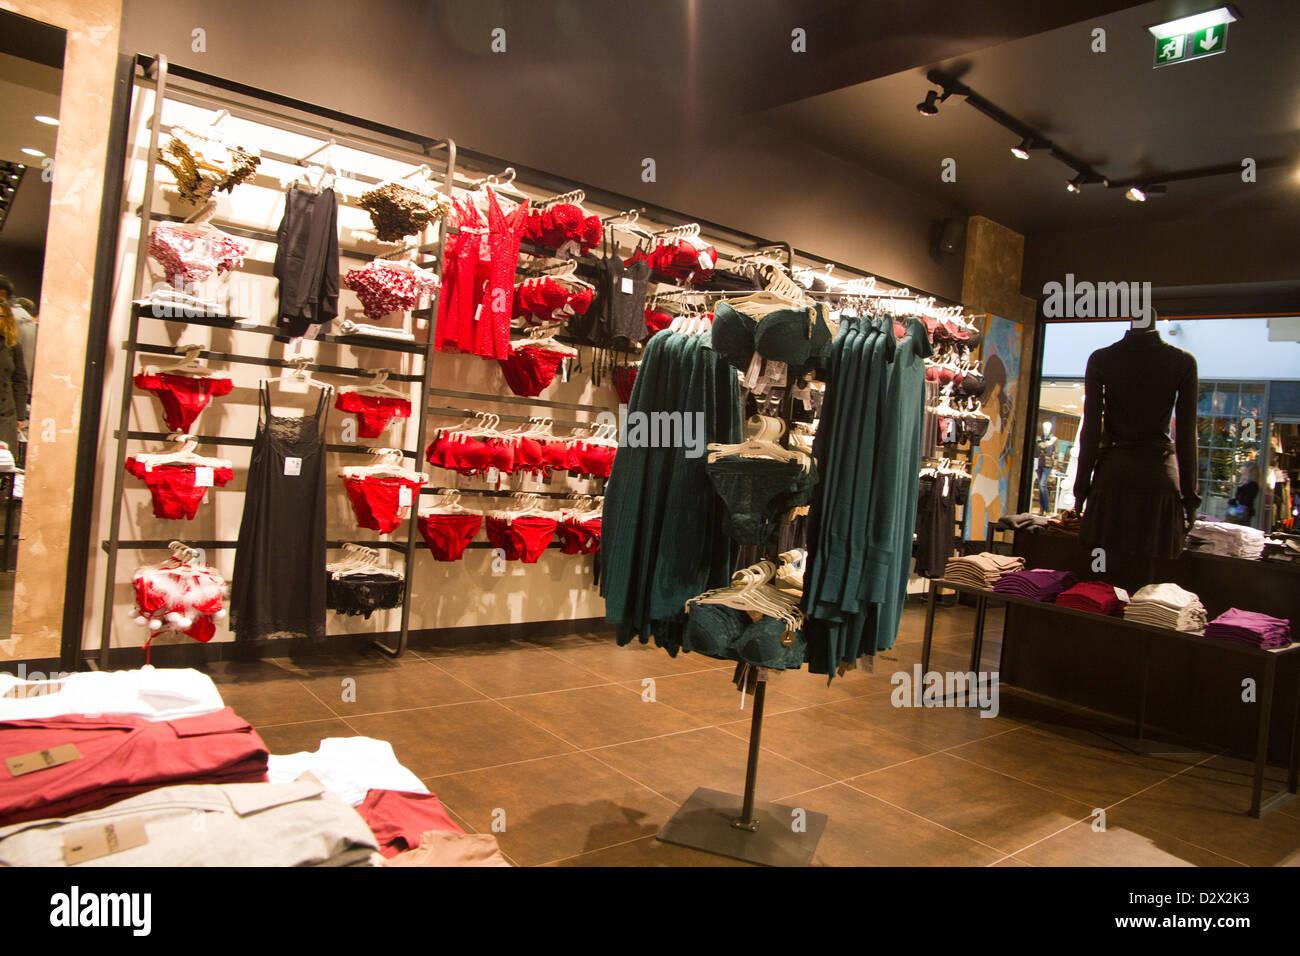 Tezenis underwear store woman red lingerie Stock Photo, Royalty ...